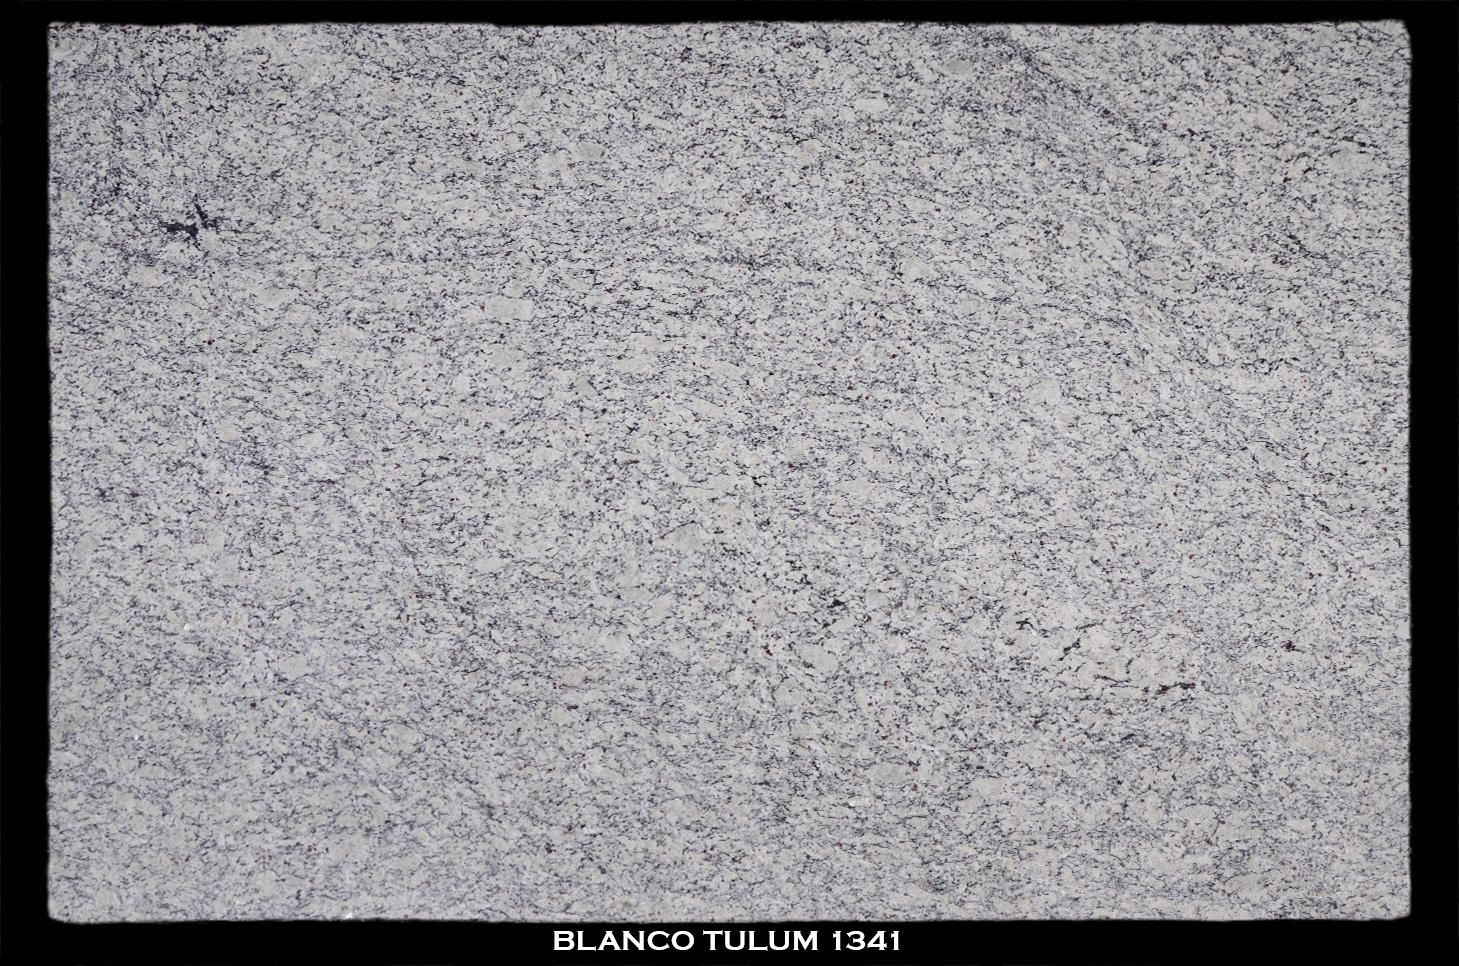 BLANCO-TULUM-1341